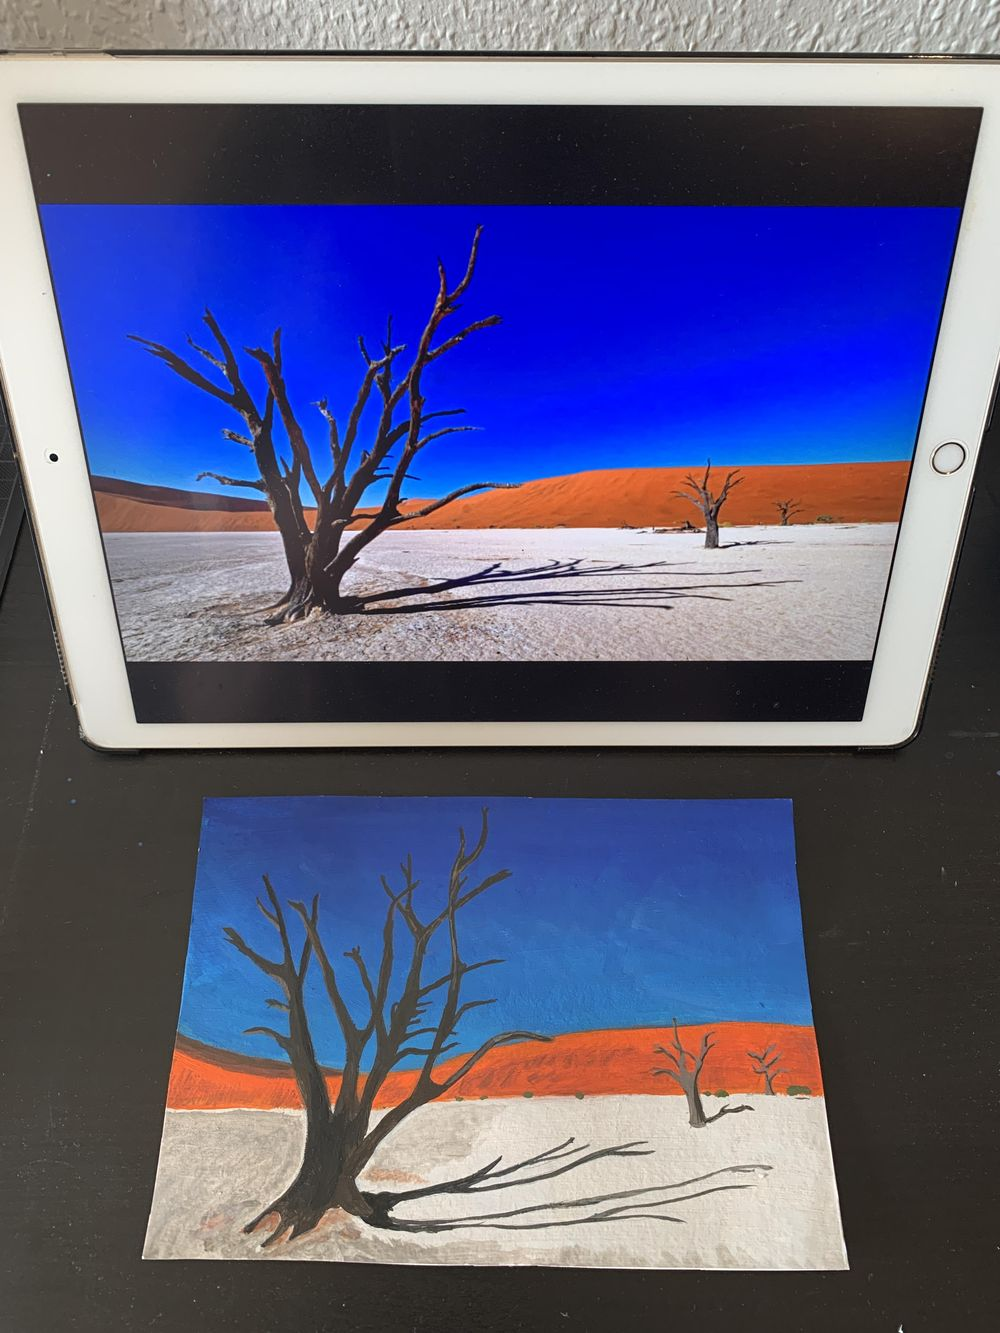 Desert - image 1 - student project